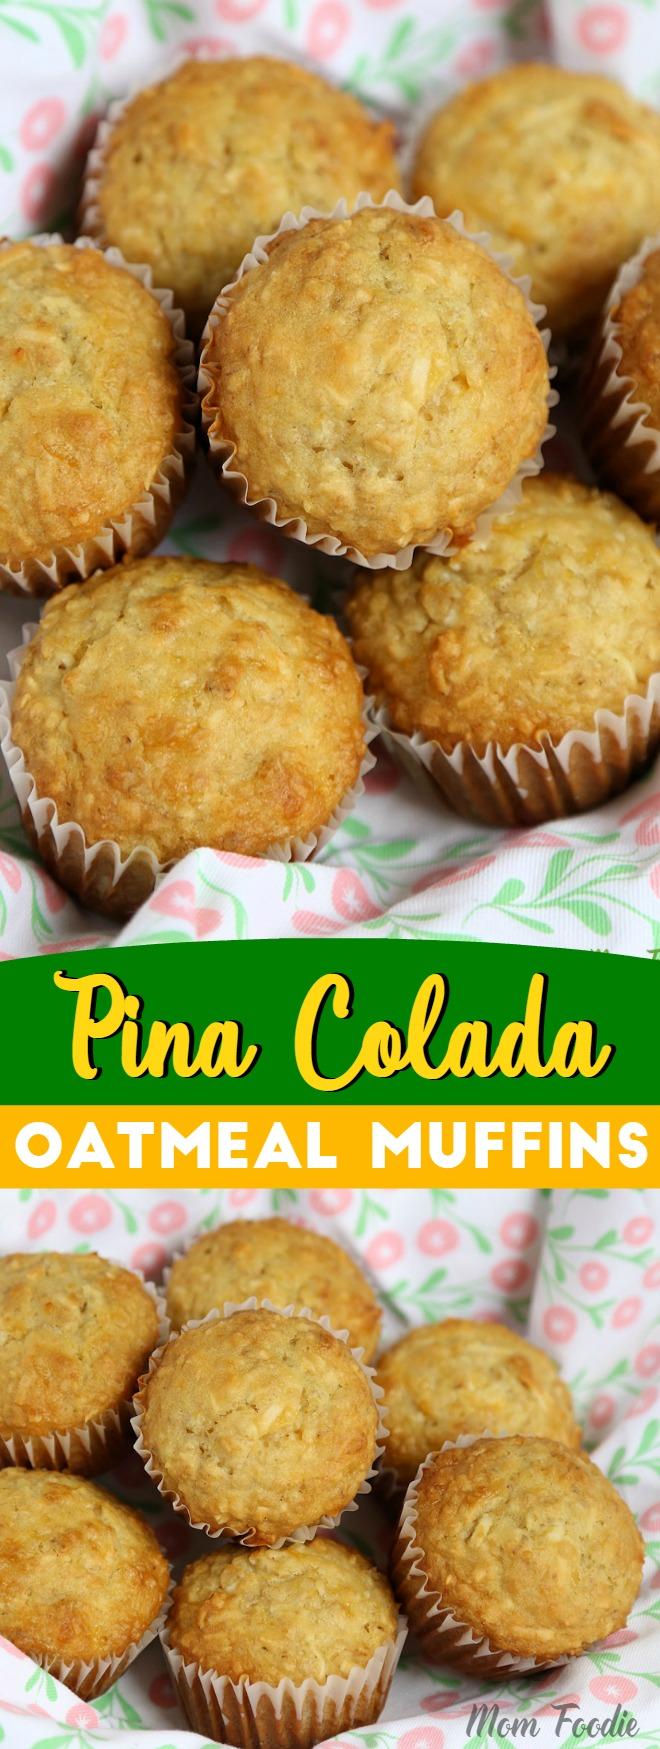 Pina Colada Muffins Recipe - Coconut Pineapple Oatmeal Muffins